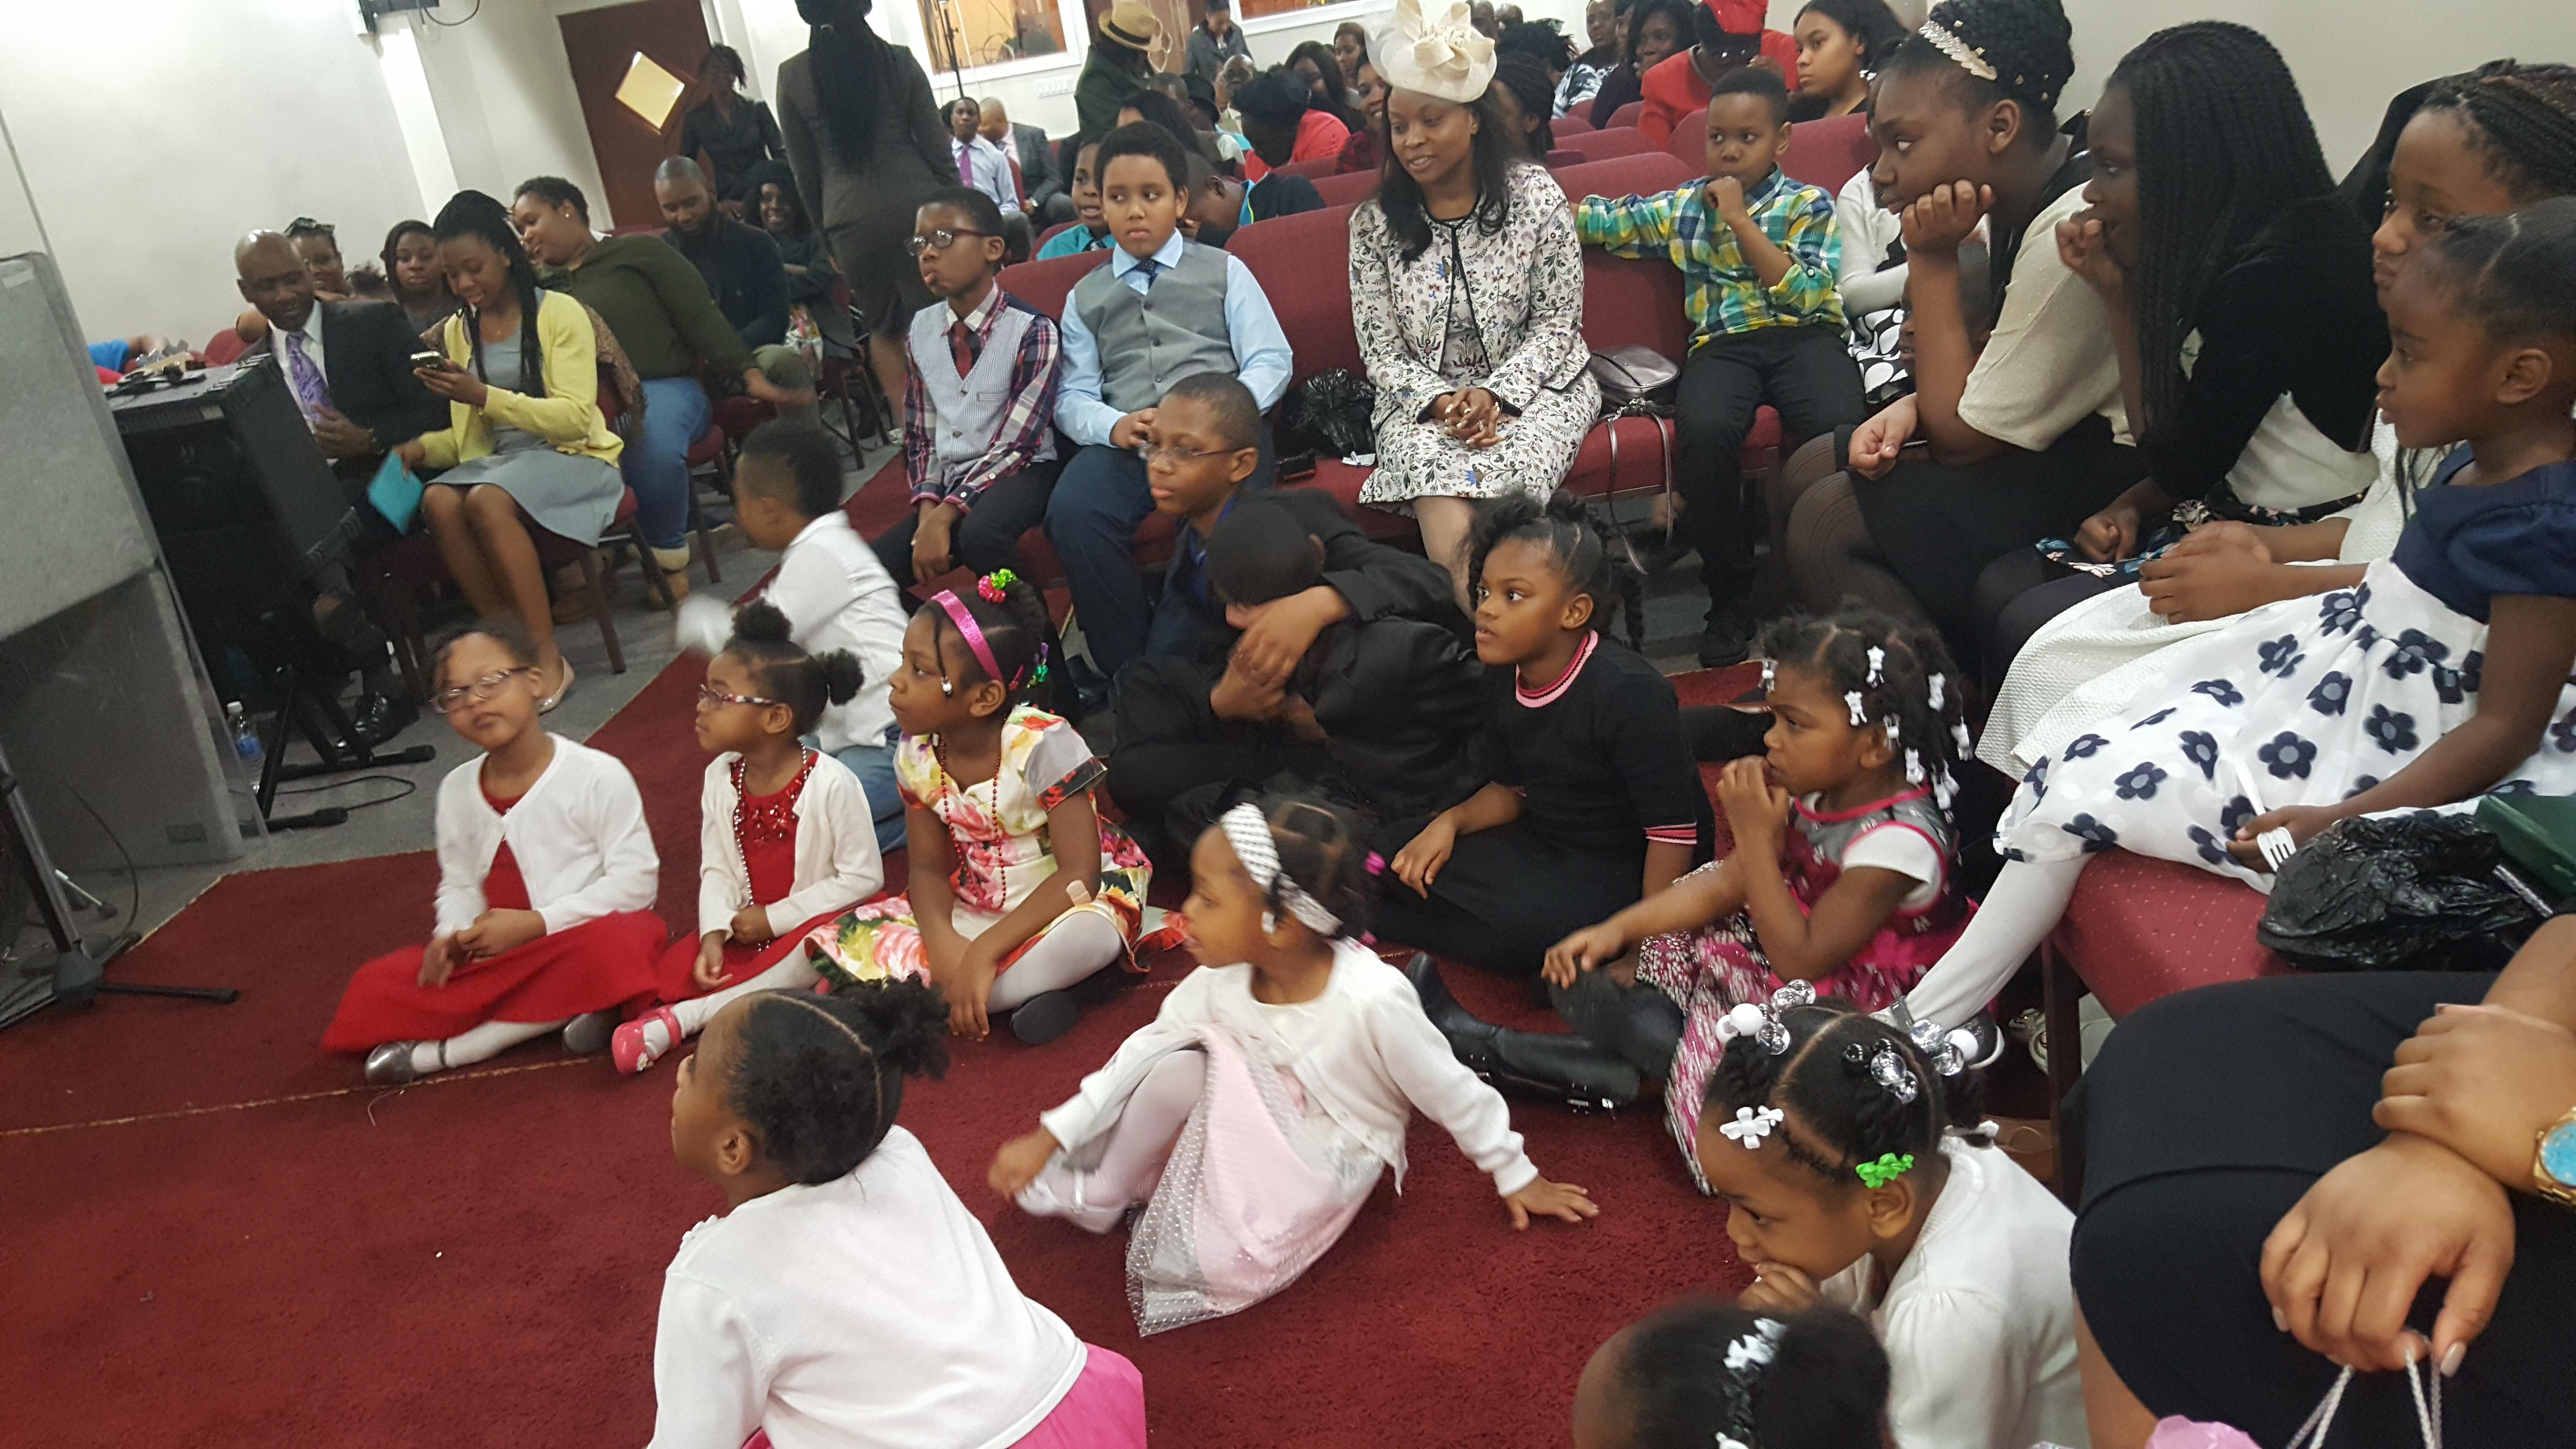 Apostolic Church of God 7th Day Children Appreciation Day